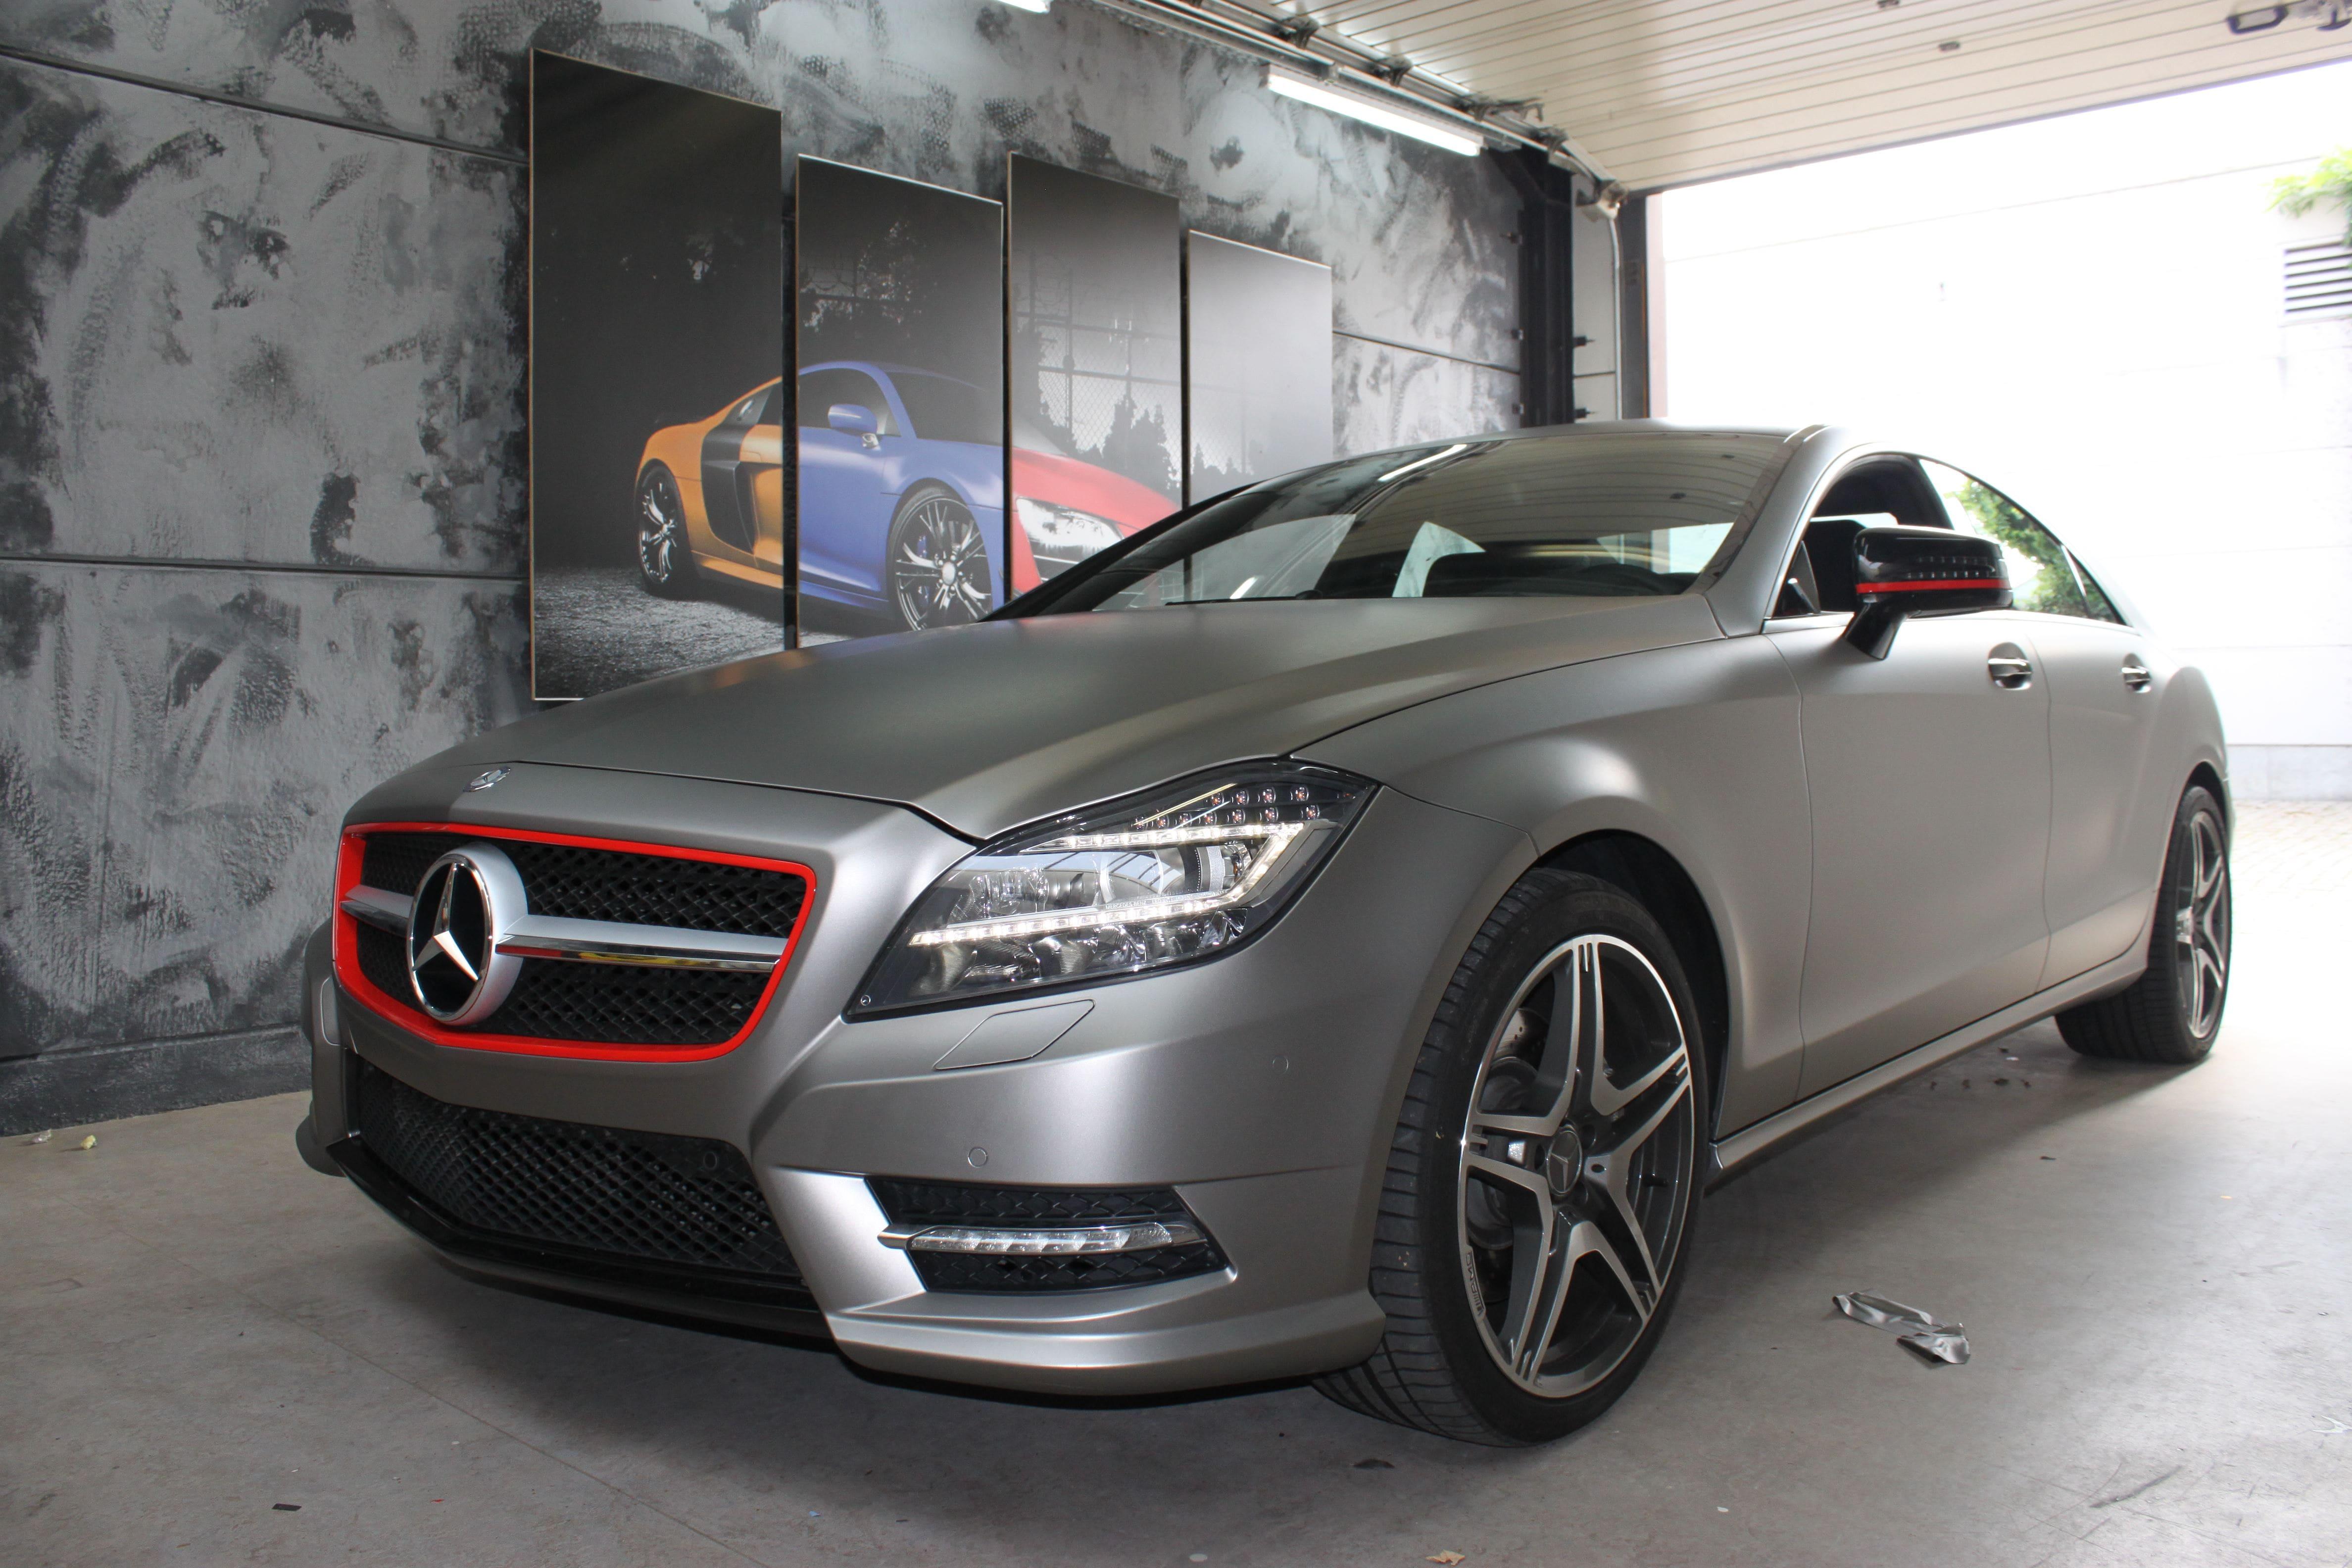 Mercedes CLS met Mat Grey Aluminium Wrap, Carwrapping door Wrapmyride.nu Foto-nr:6170, ©2020